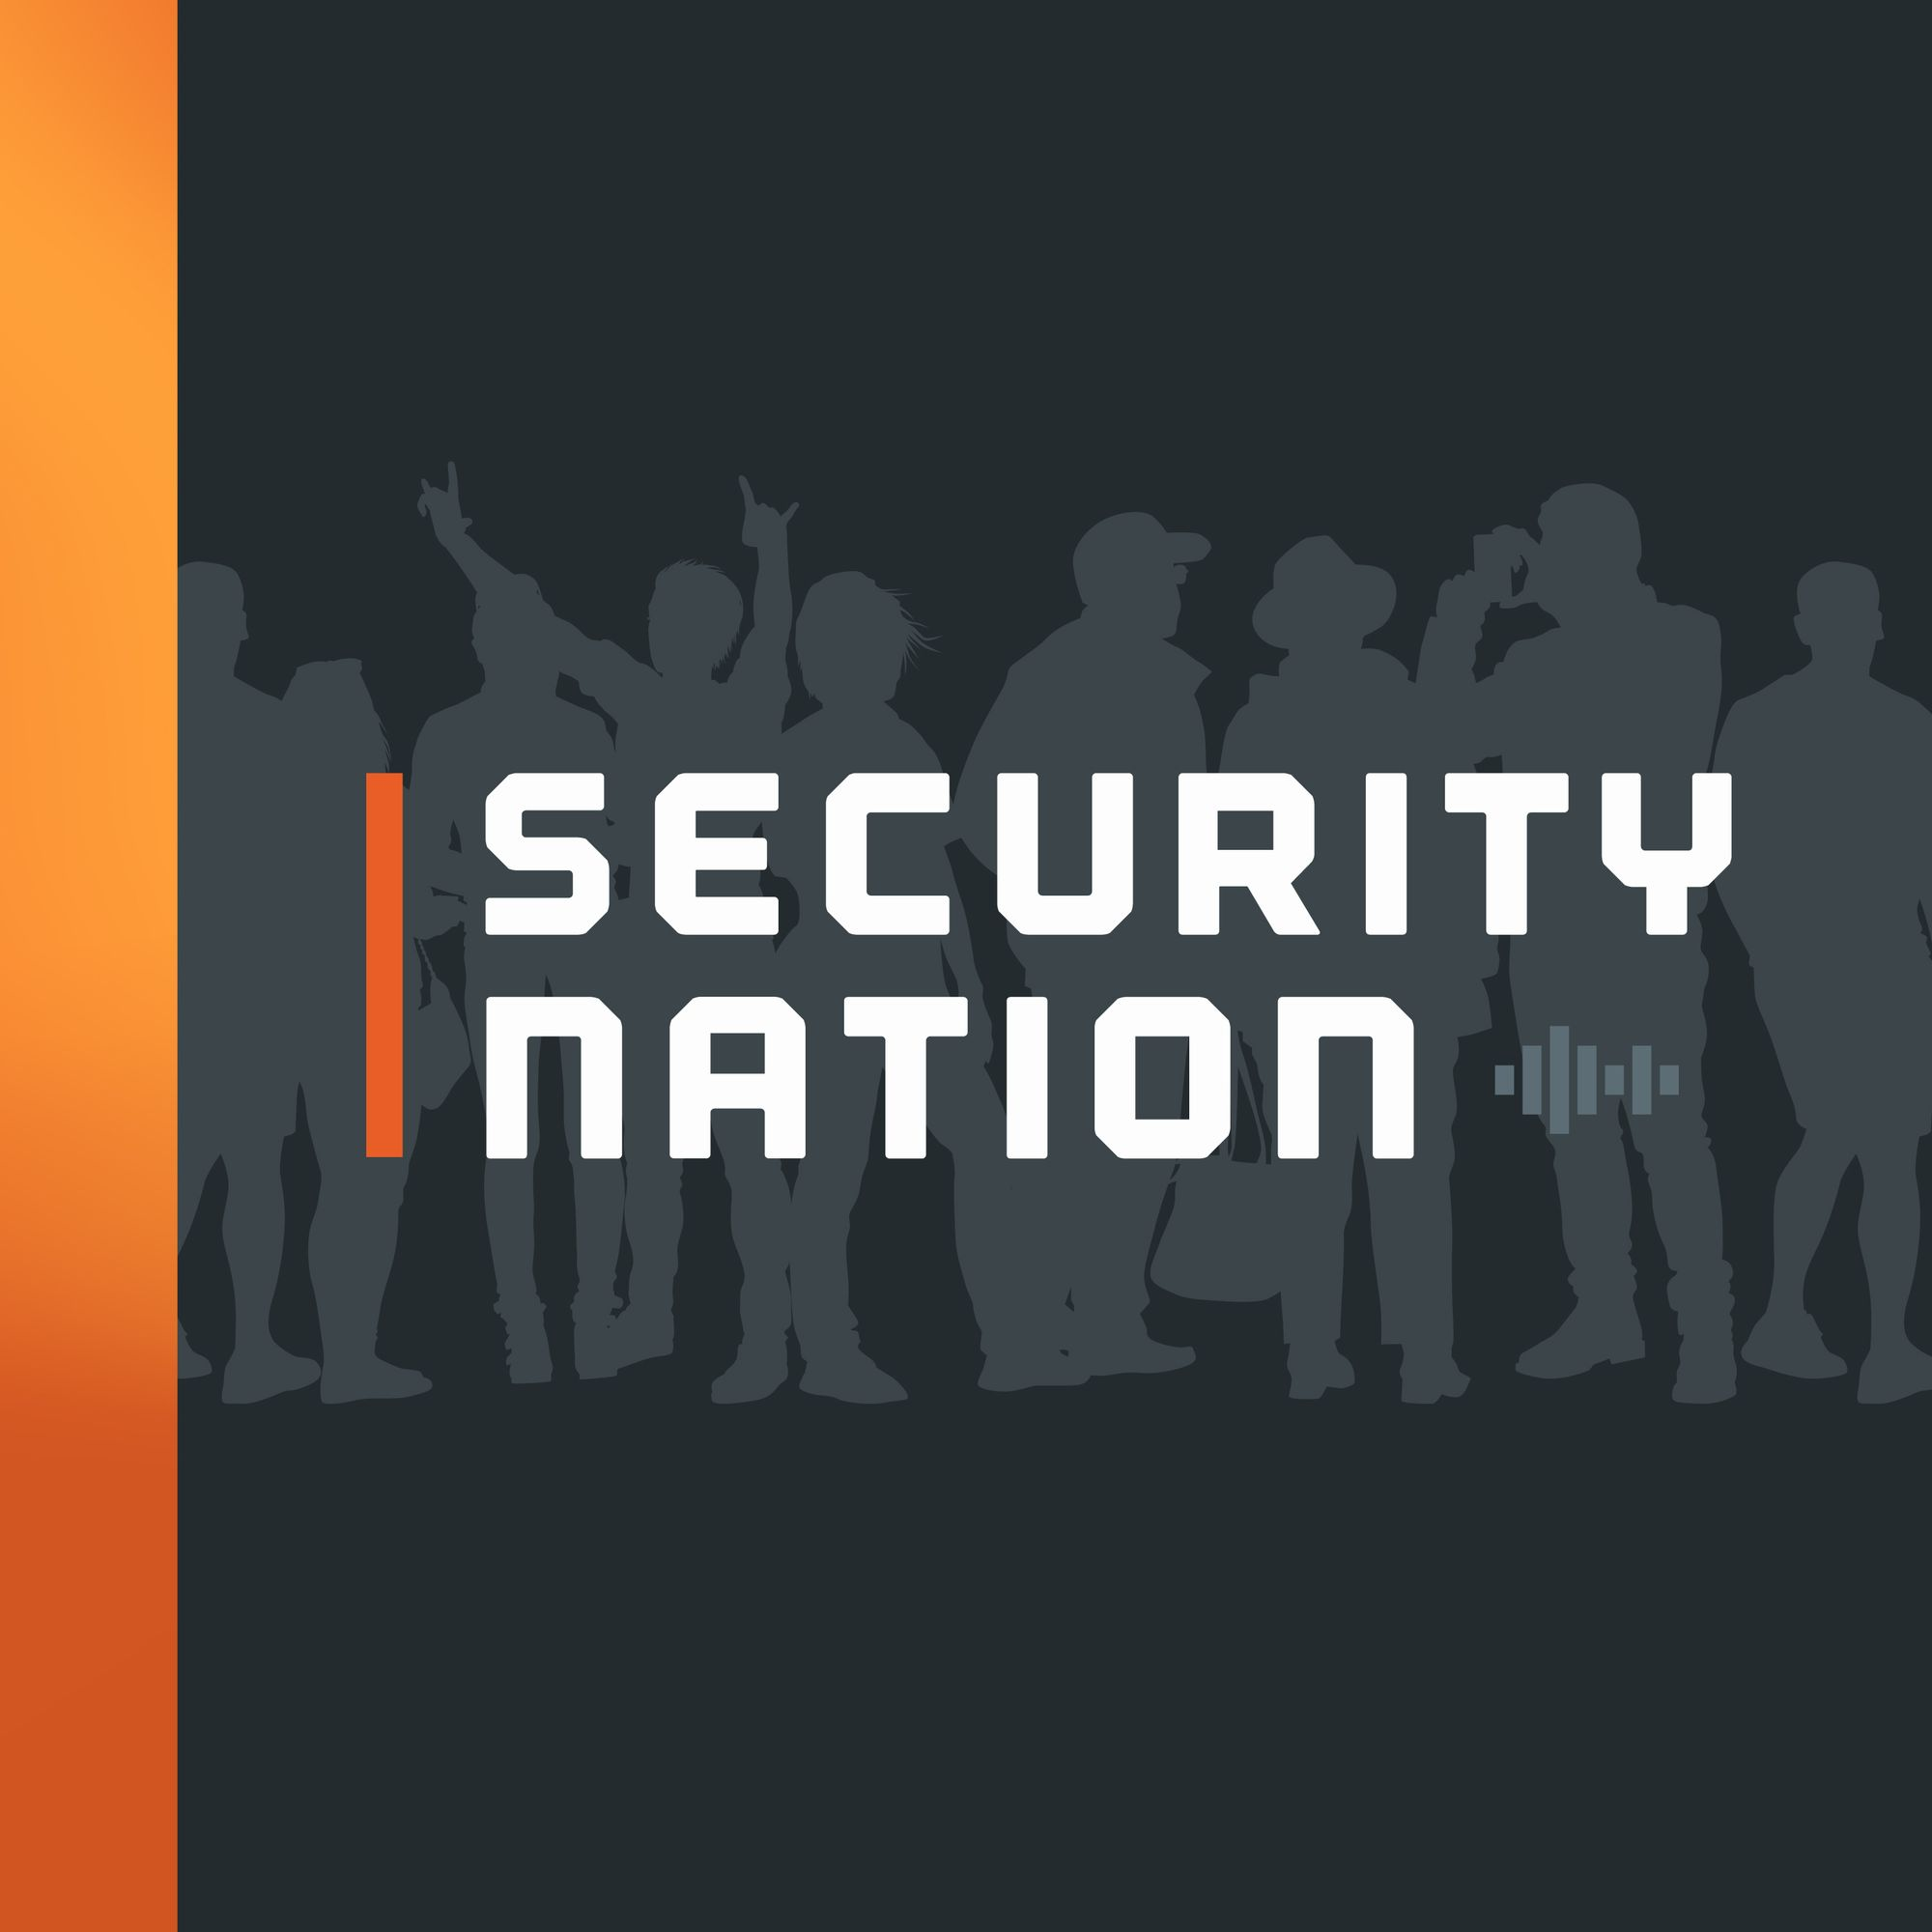 [Security Nation] Jill Fraser and Deborah Blyth on Securing Colorado